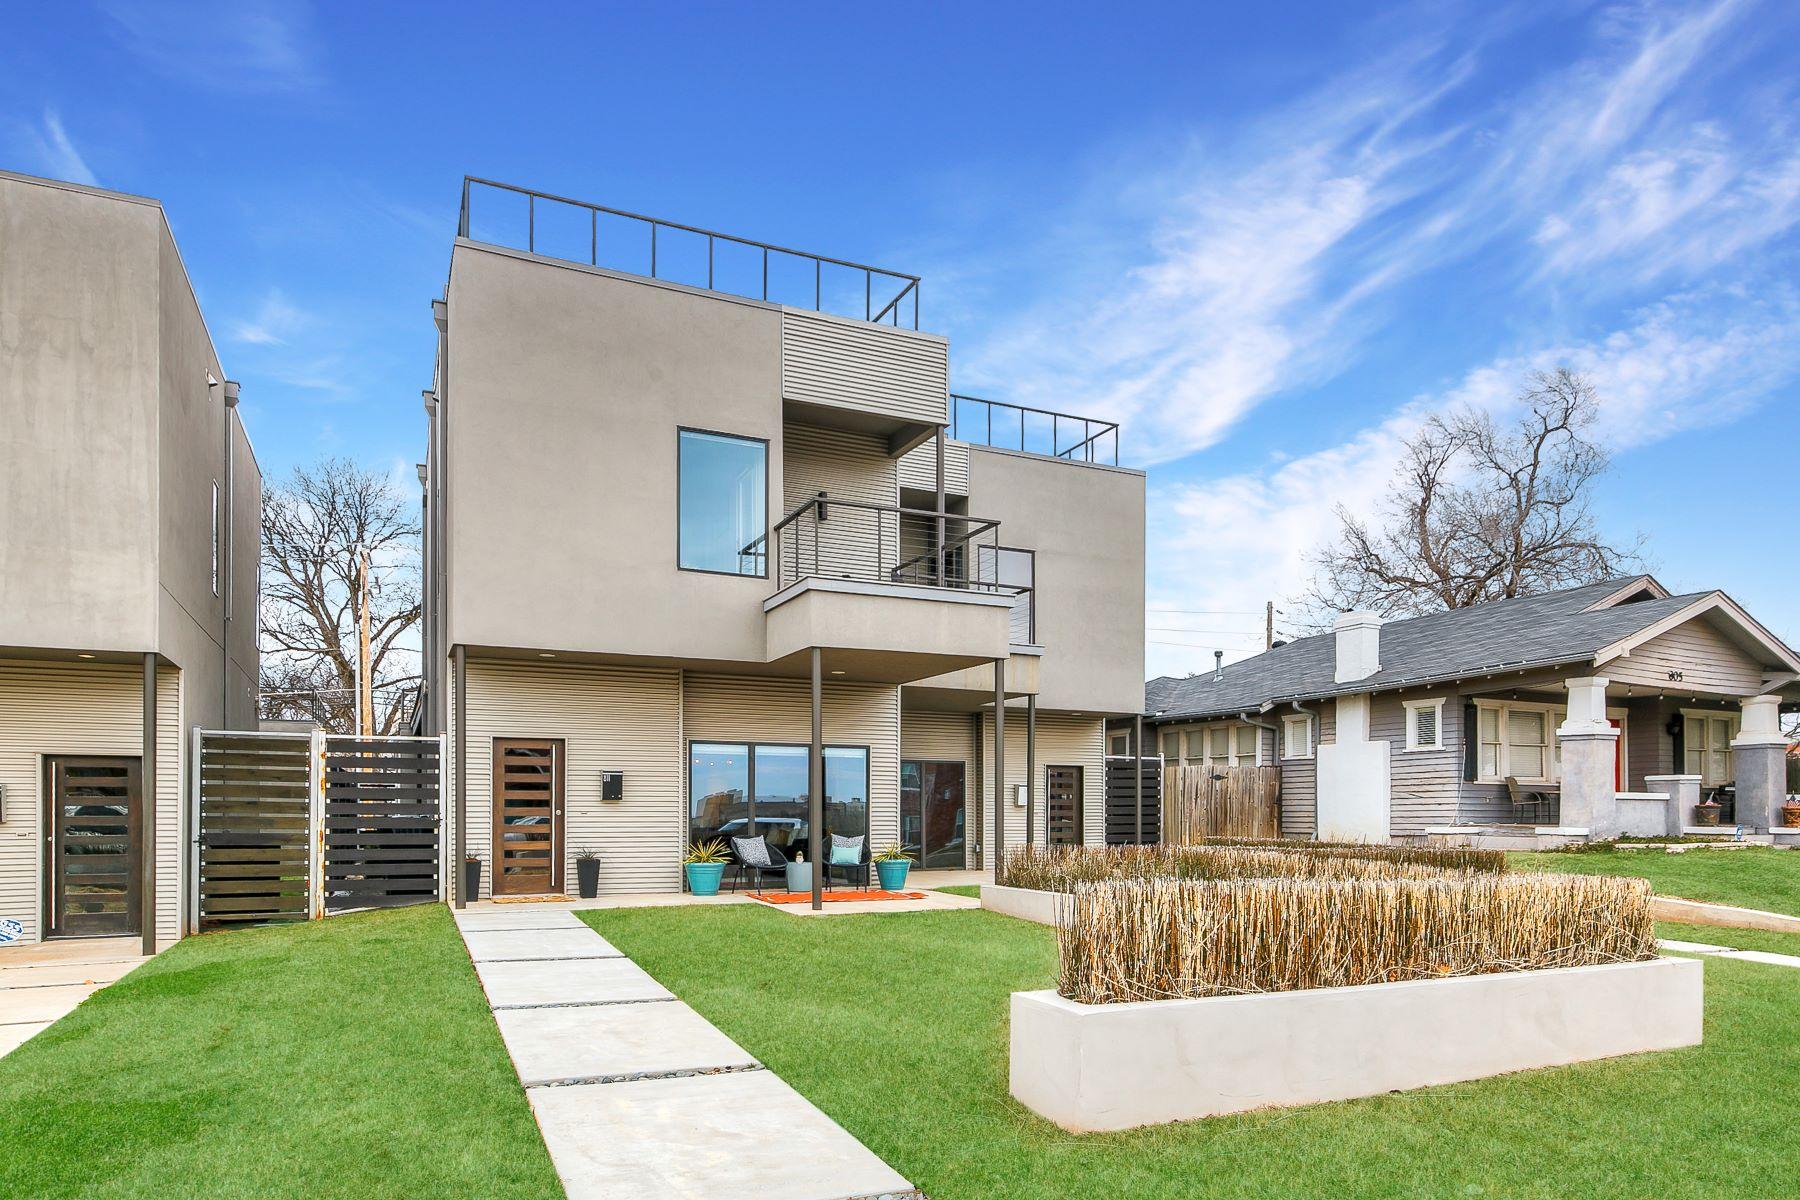 Single Family Homes for Active at Sophistication in SoSA 811 NW 8th ST Oklahoma City, Oklahoma 73106 United States